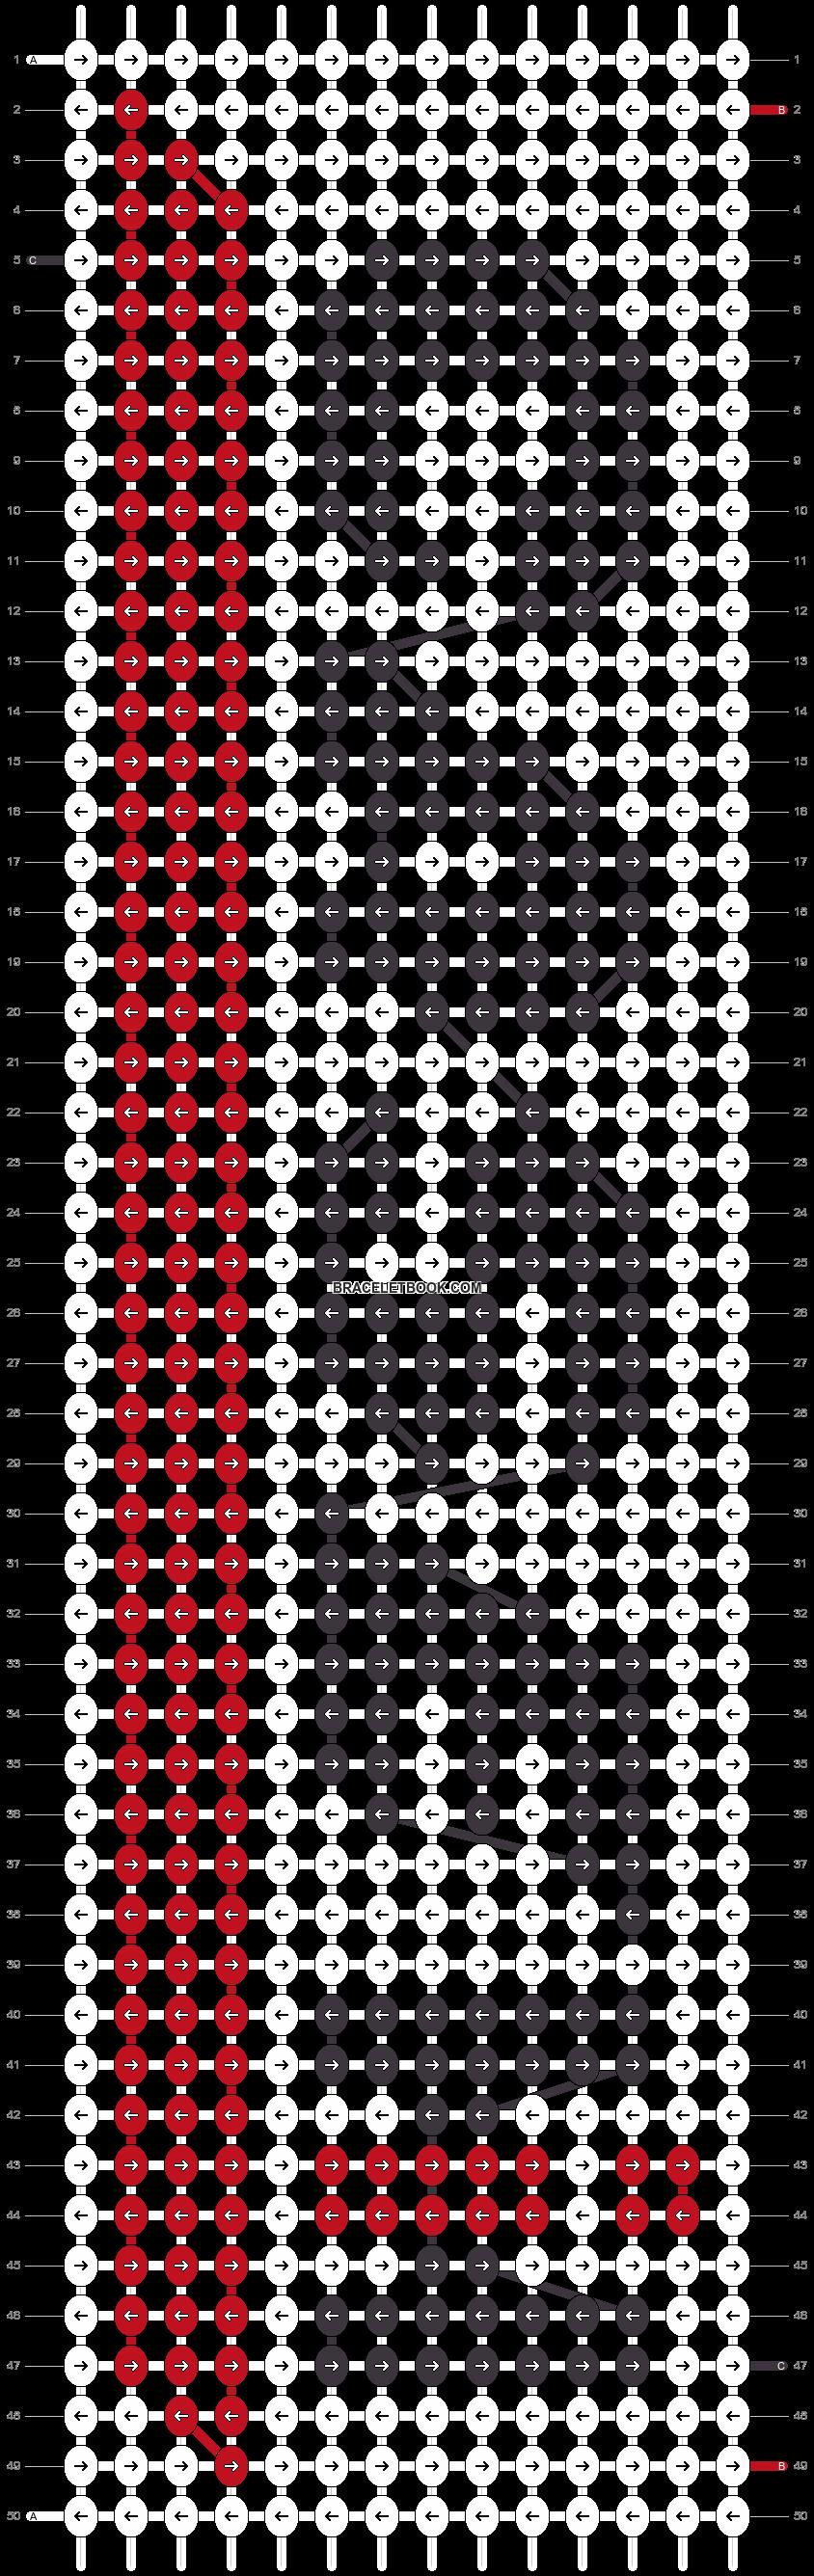 Alpha pattern #10686 pattern